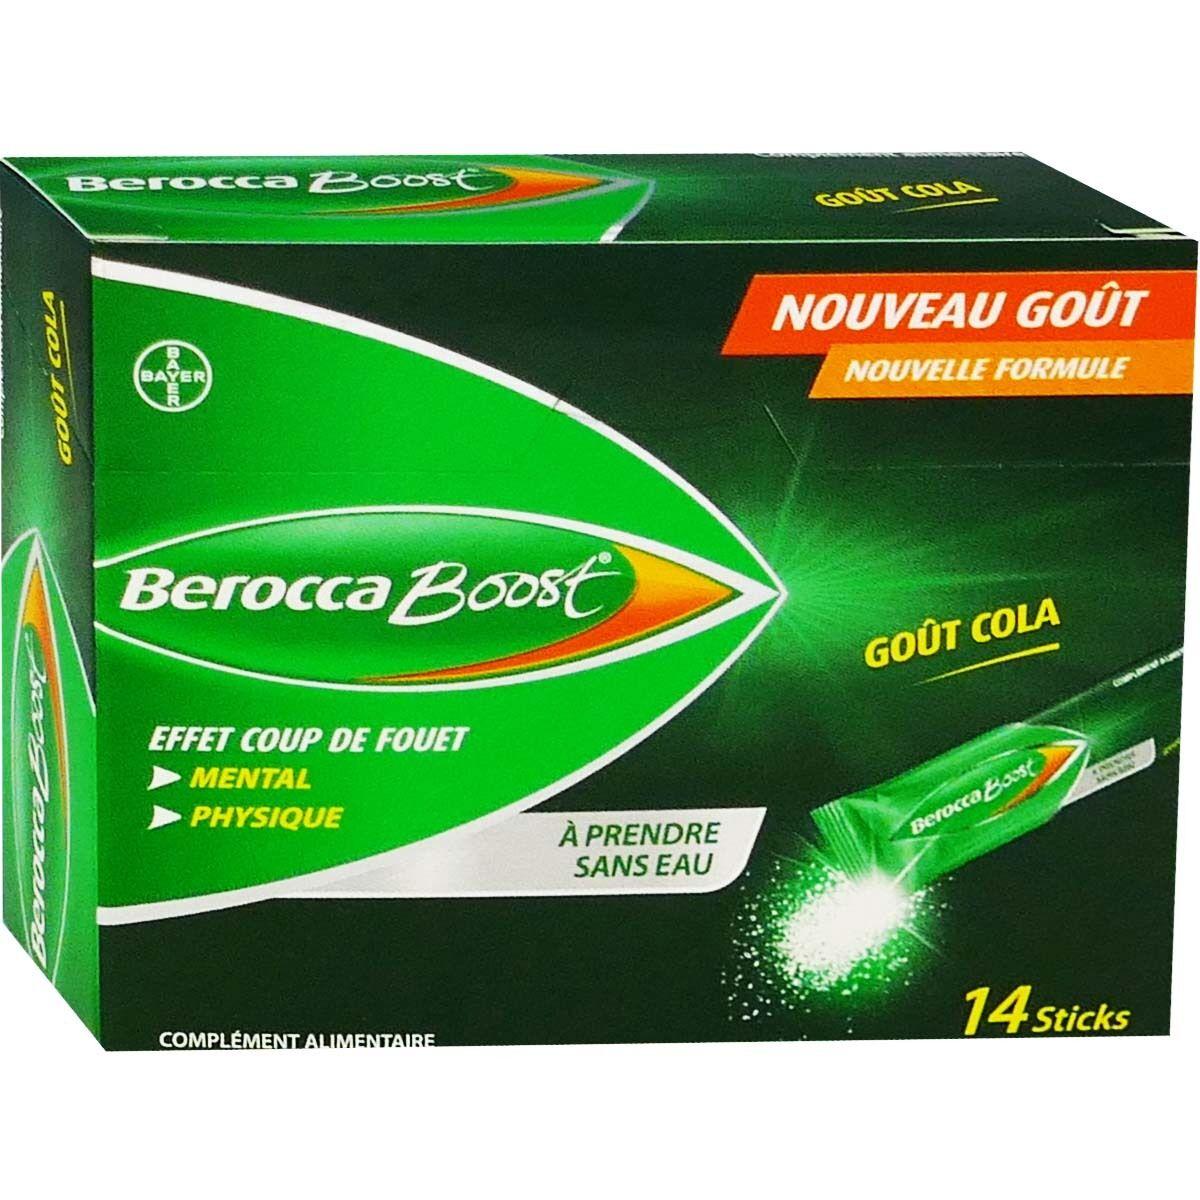 BAYER Berocca boost gout cola 14 sticks coup de fouet